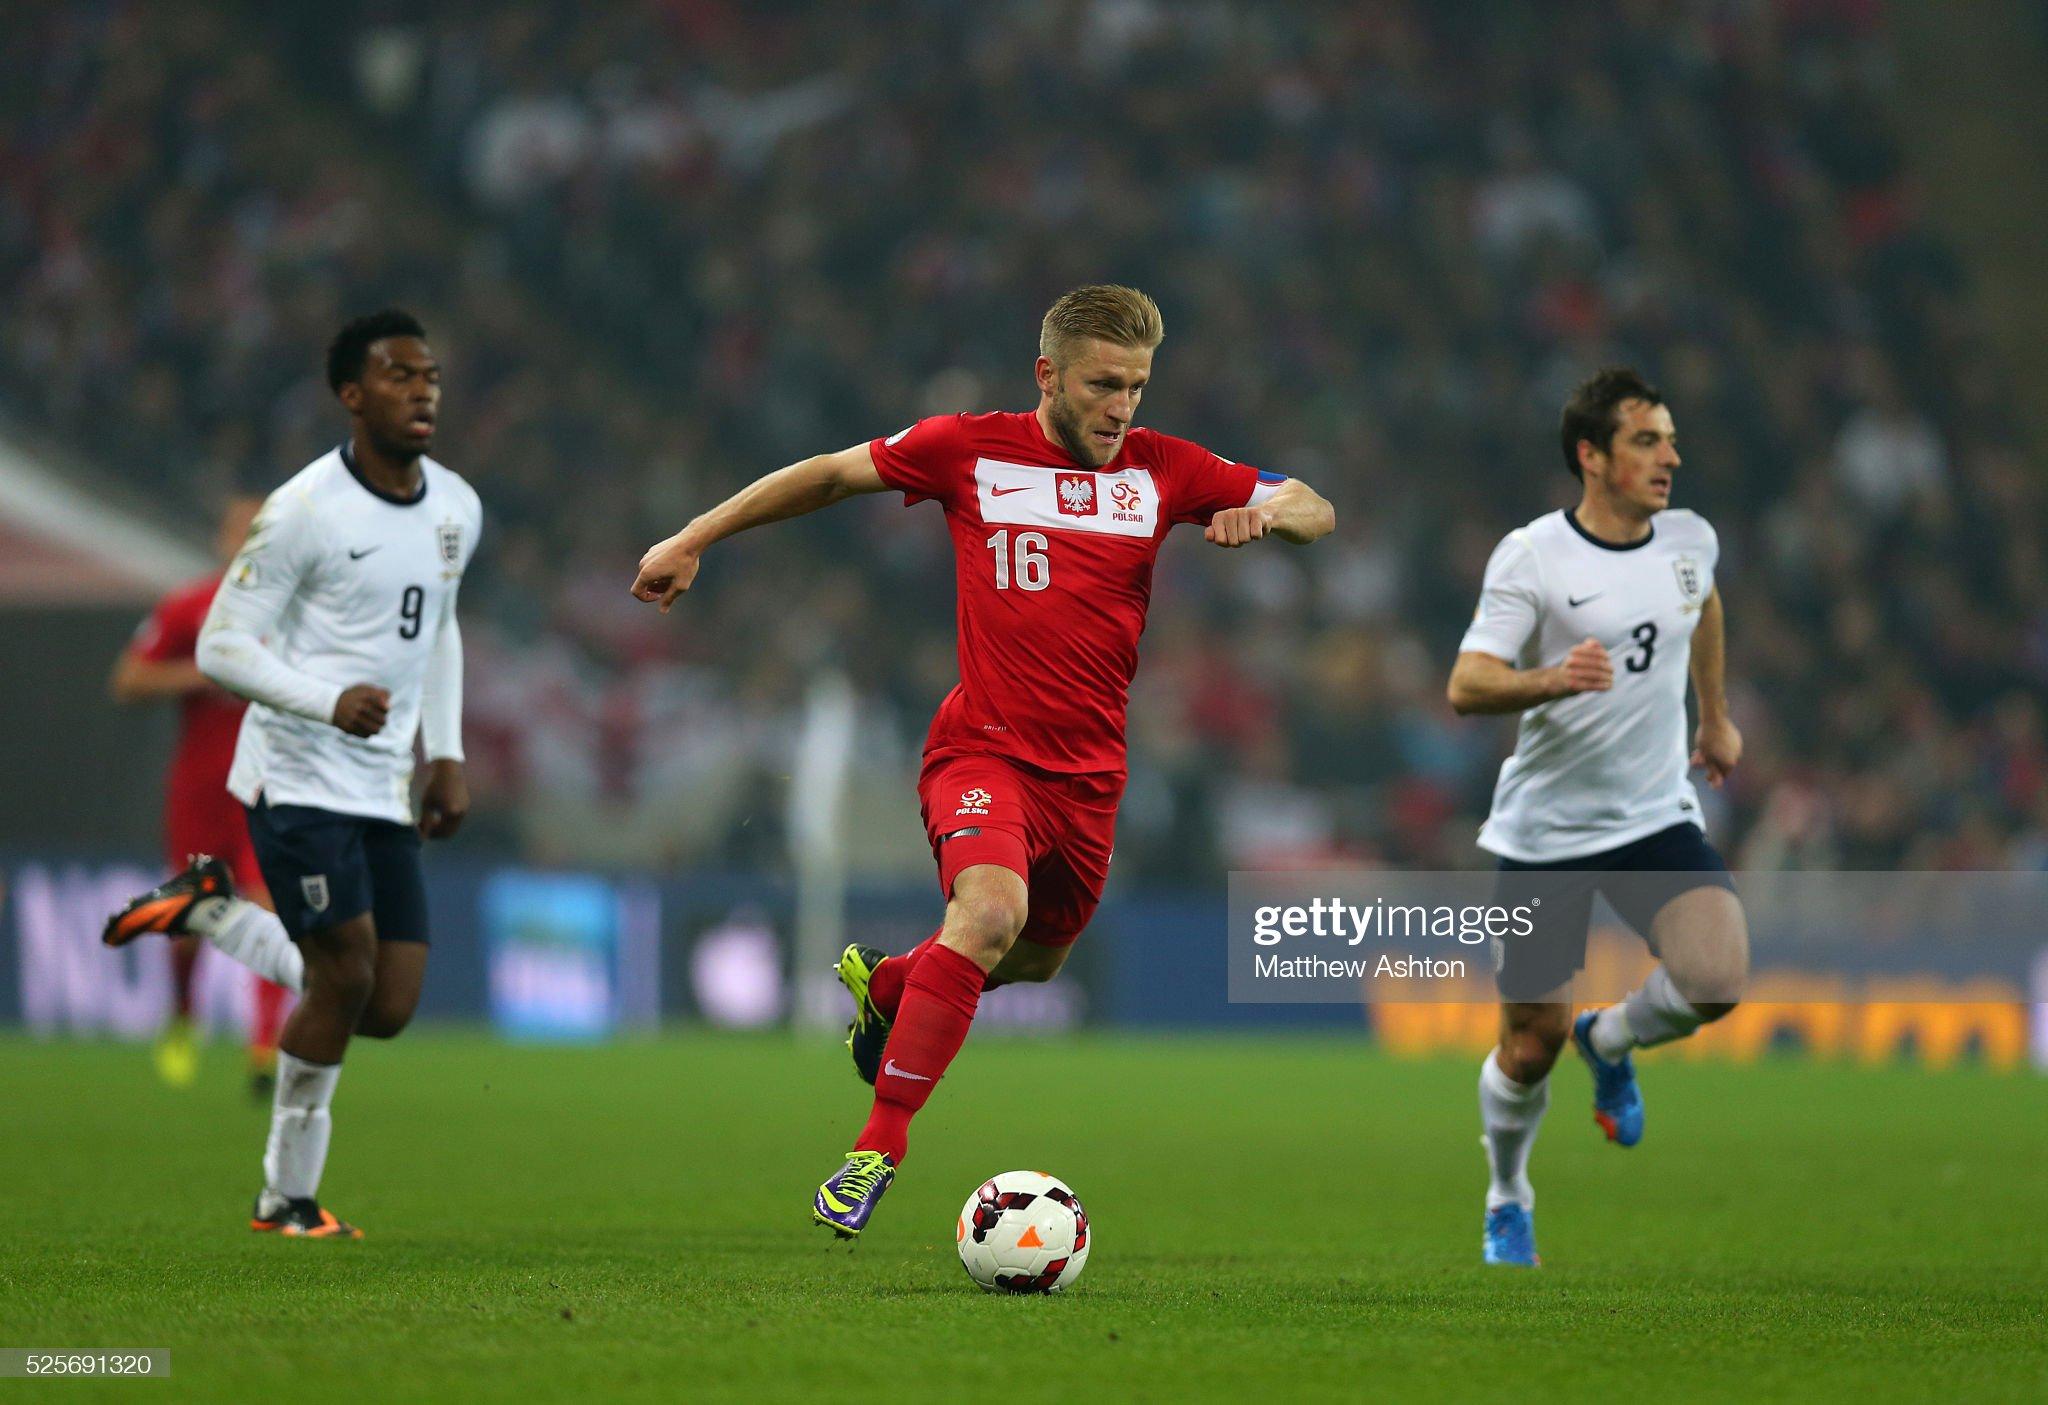 England vs Poland preview, prediction and odds